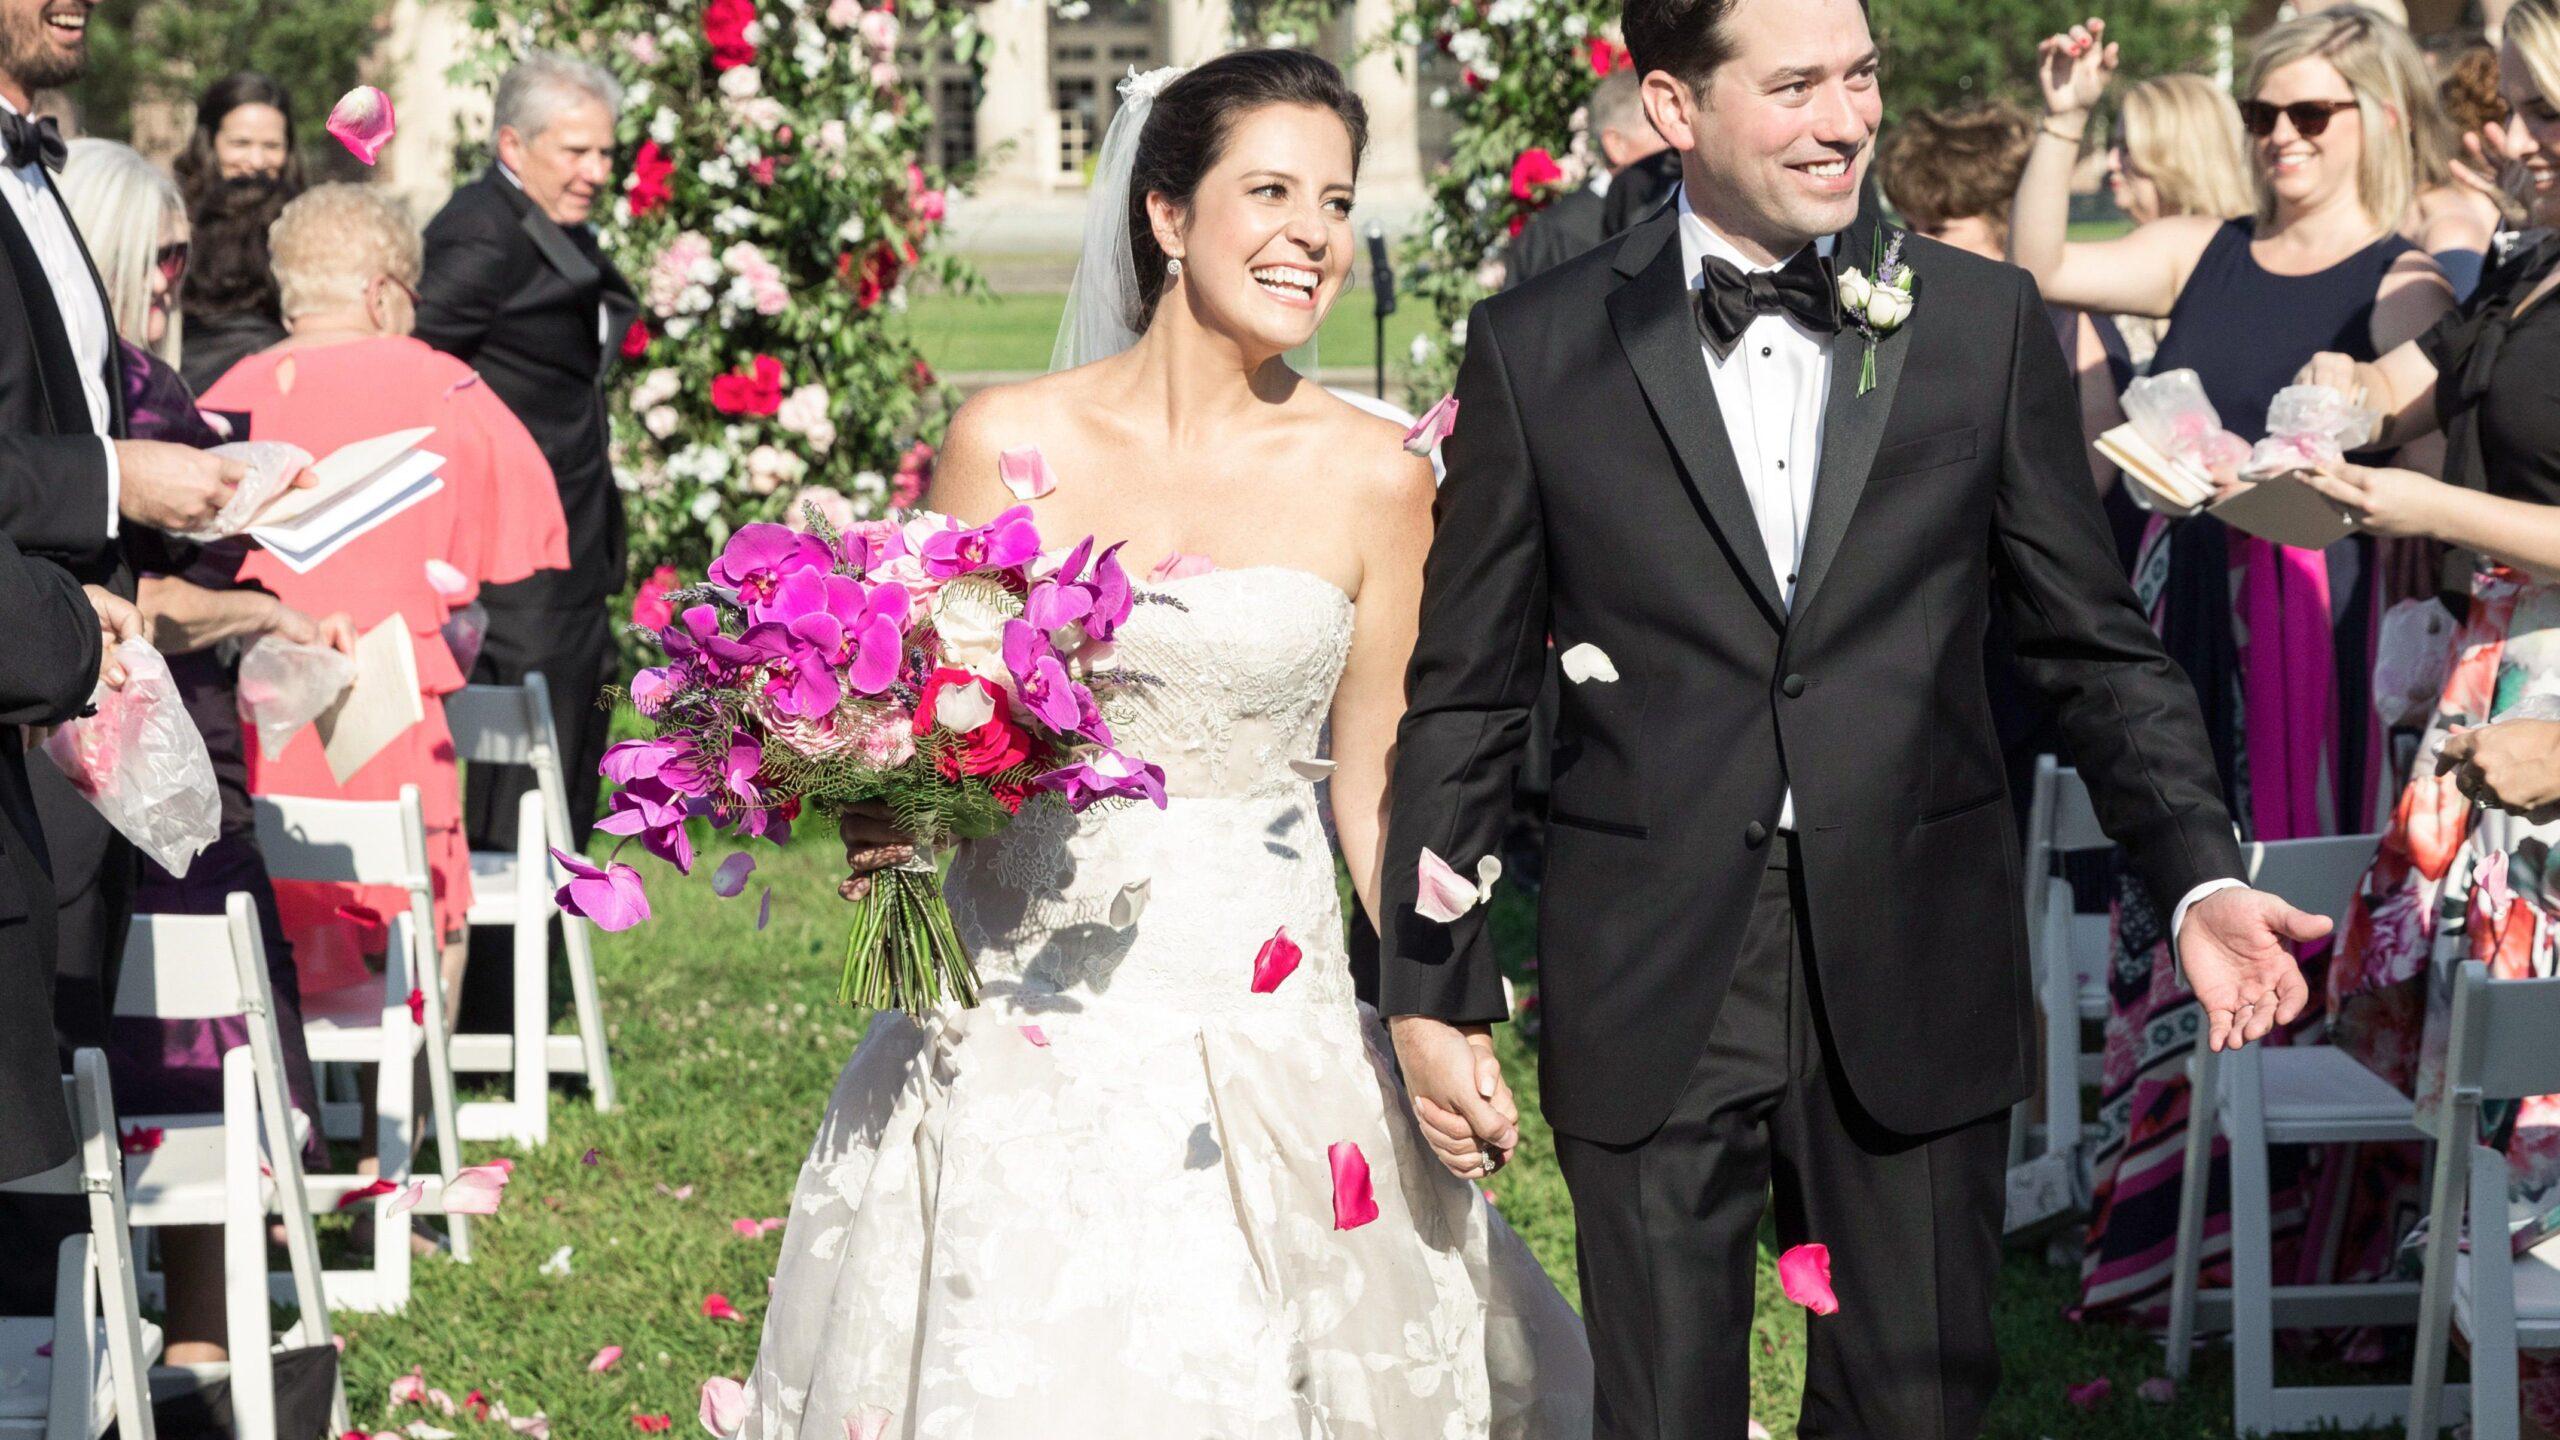 Stefanik marries Matthew Manda